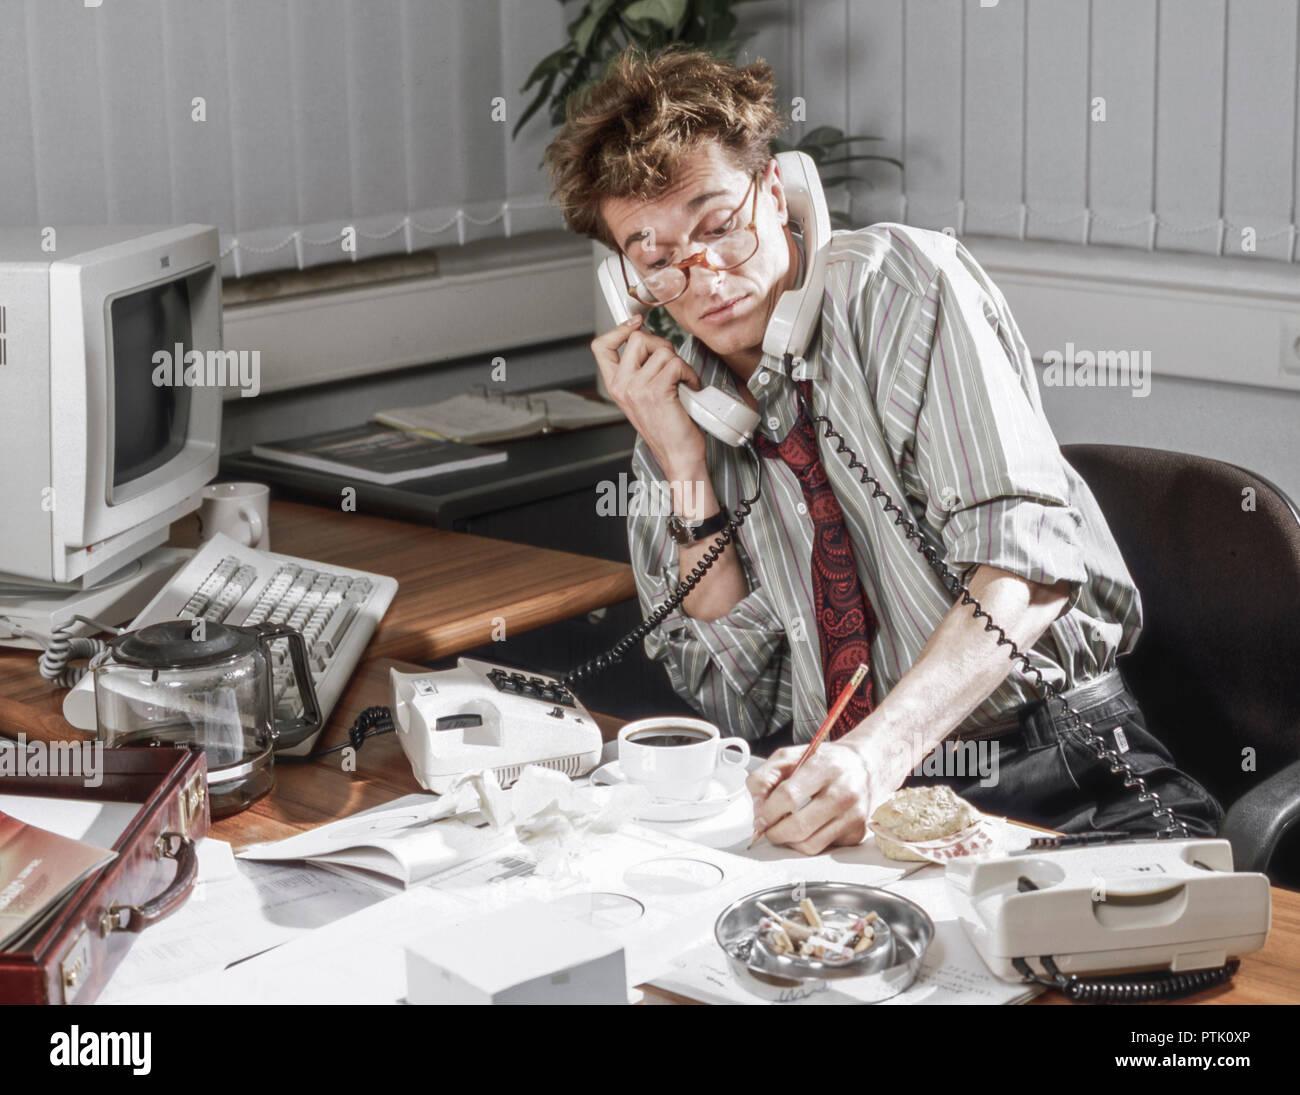 Buero Mann Stress Ueberarbeitet Chaos Telefon Rauchen Buro